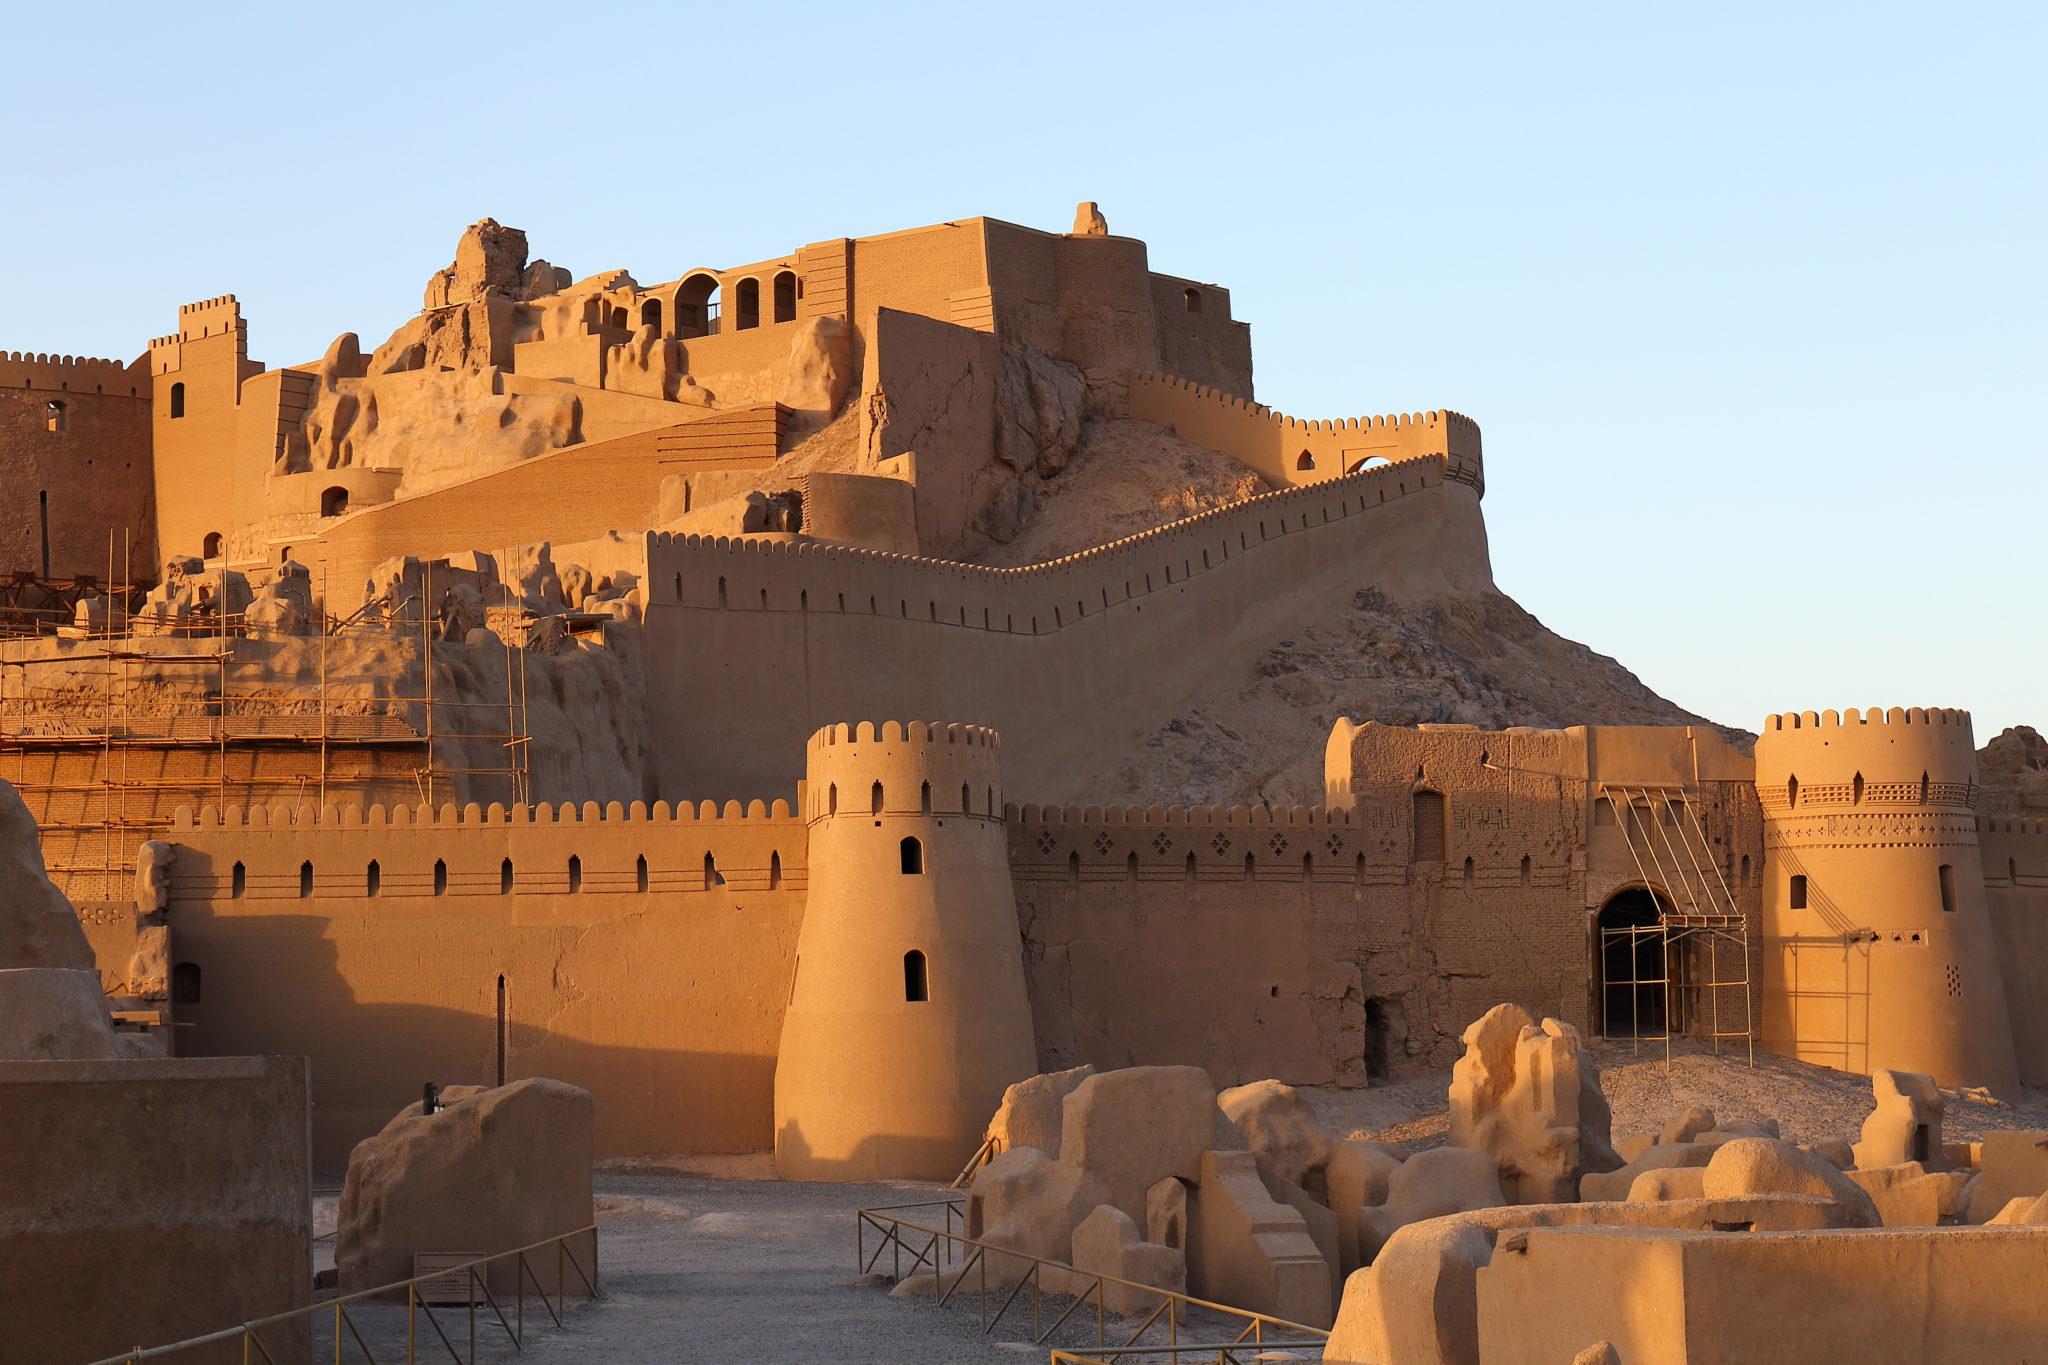 An adobe citadel rising up a hill.